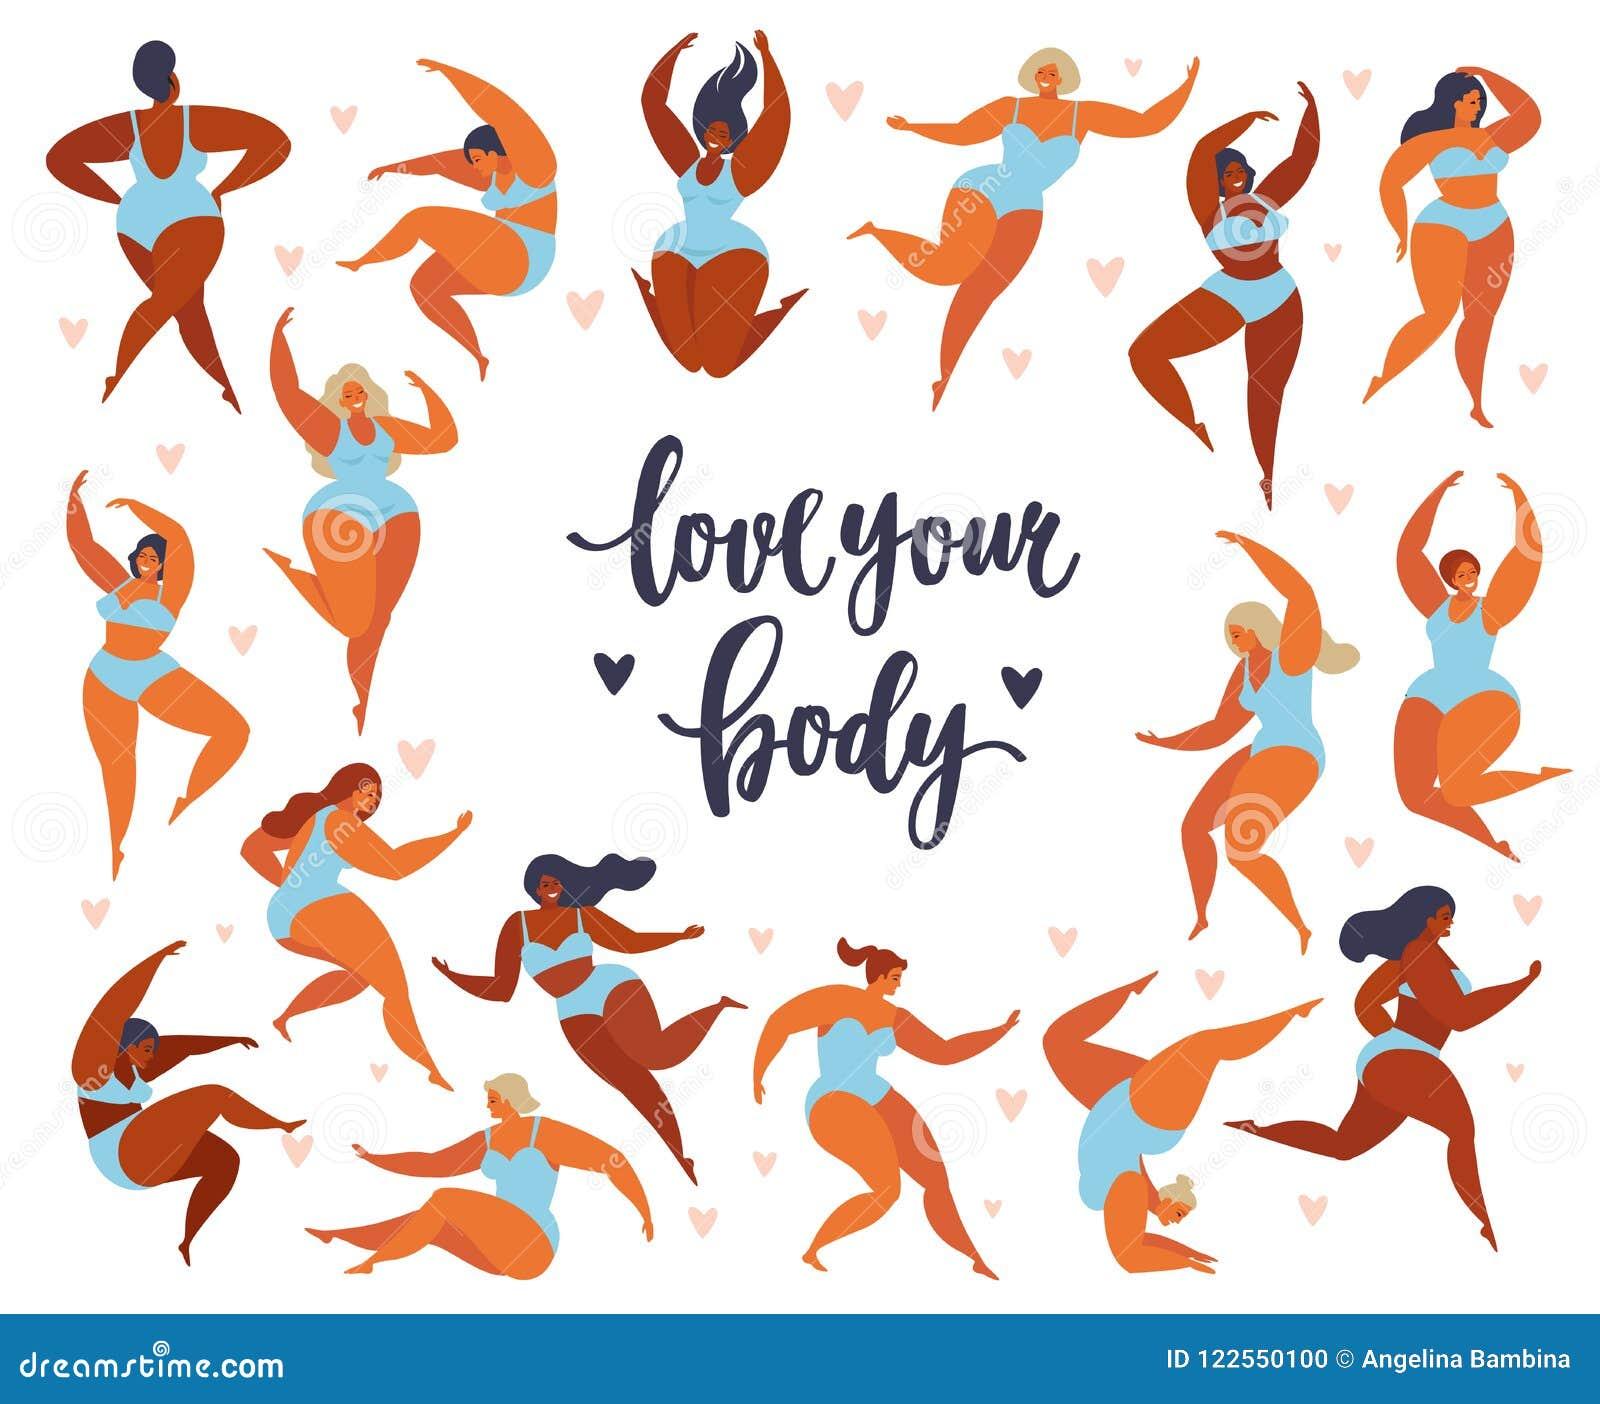 feminism and body image